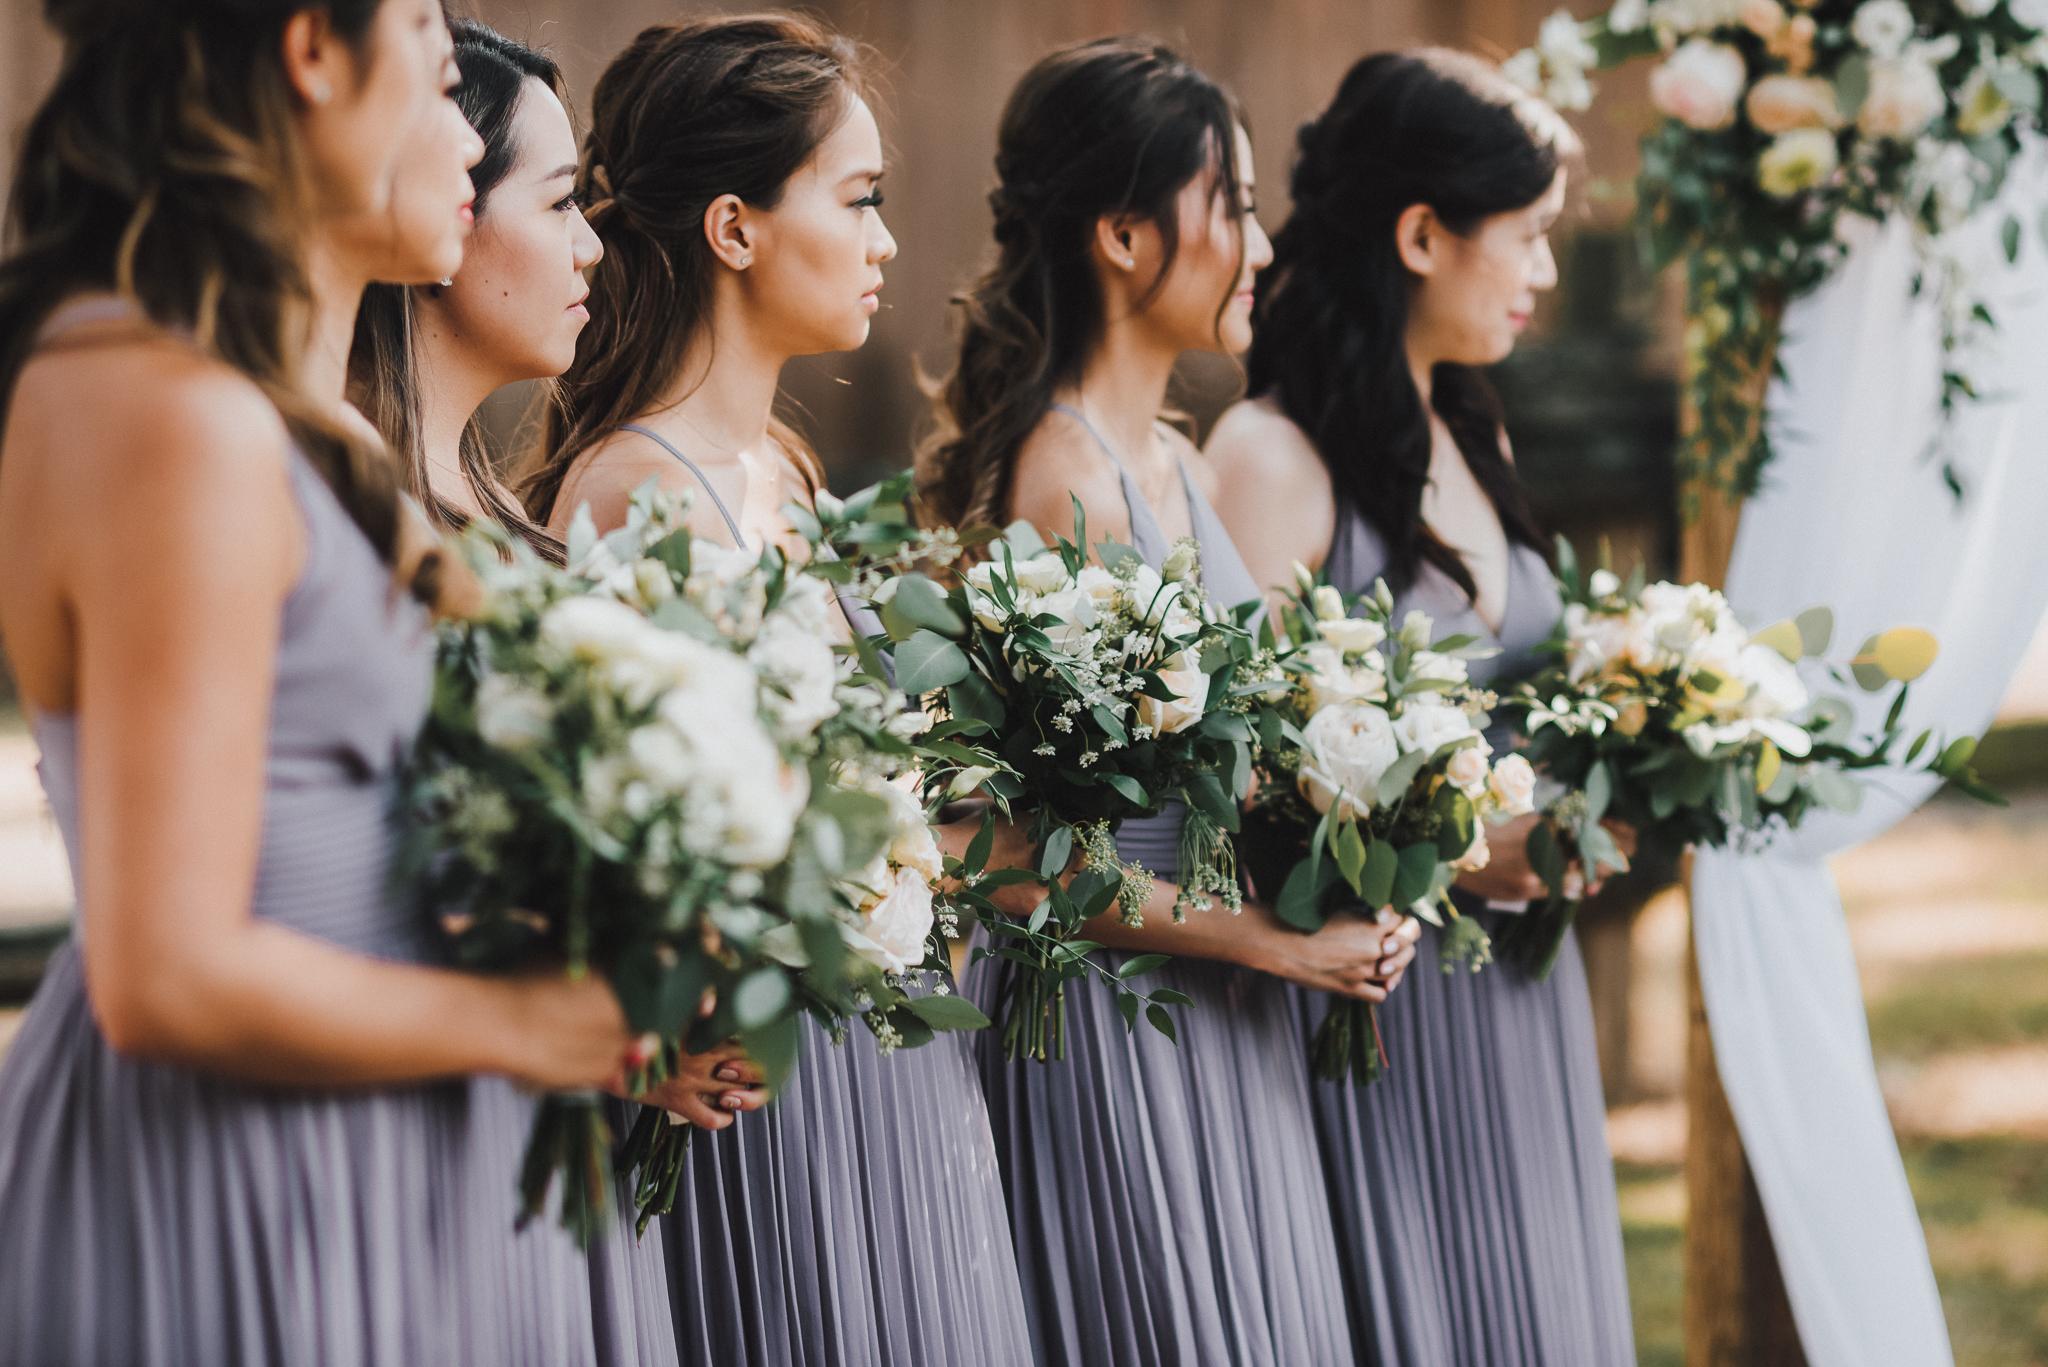 wellbrookwinerywedding-carrieaugustine-thekoebels-31.jpg